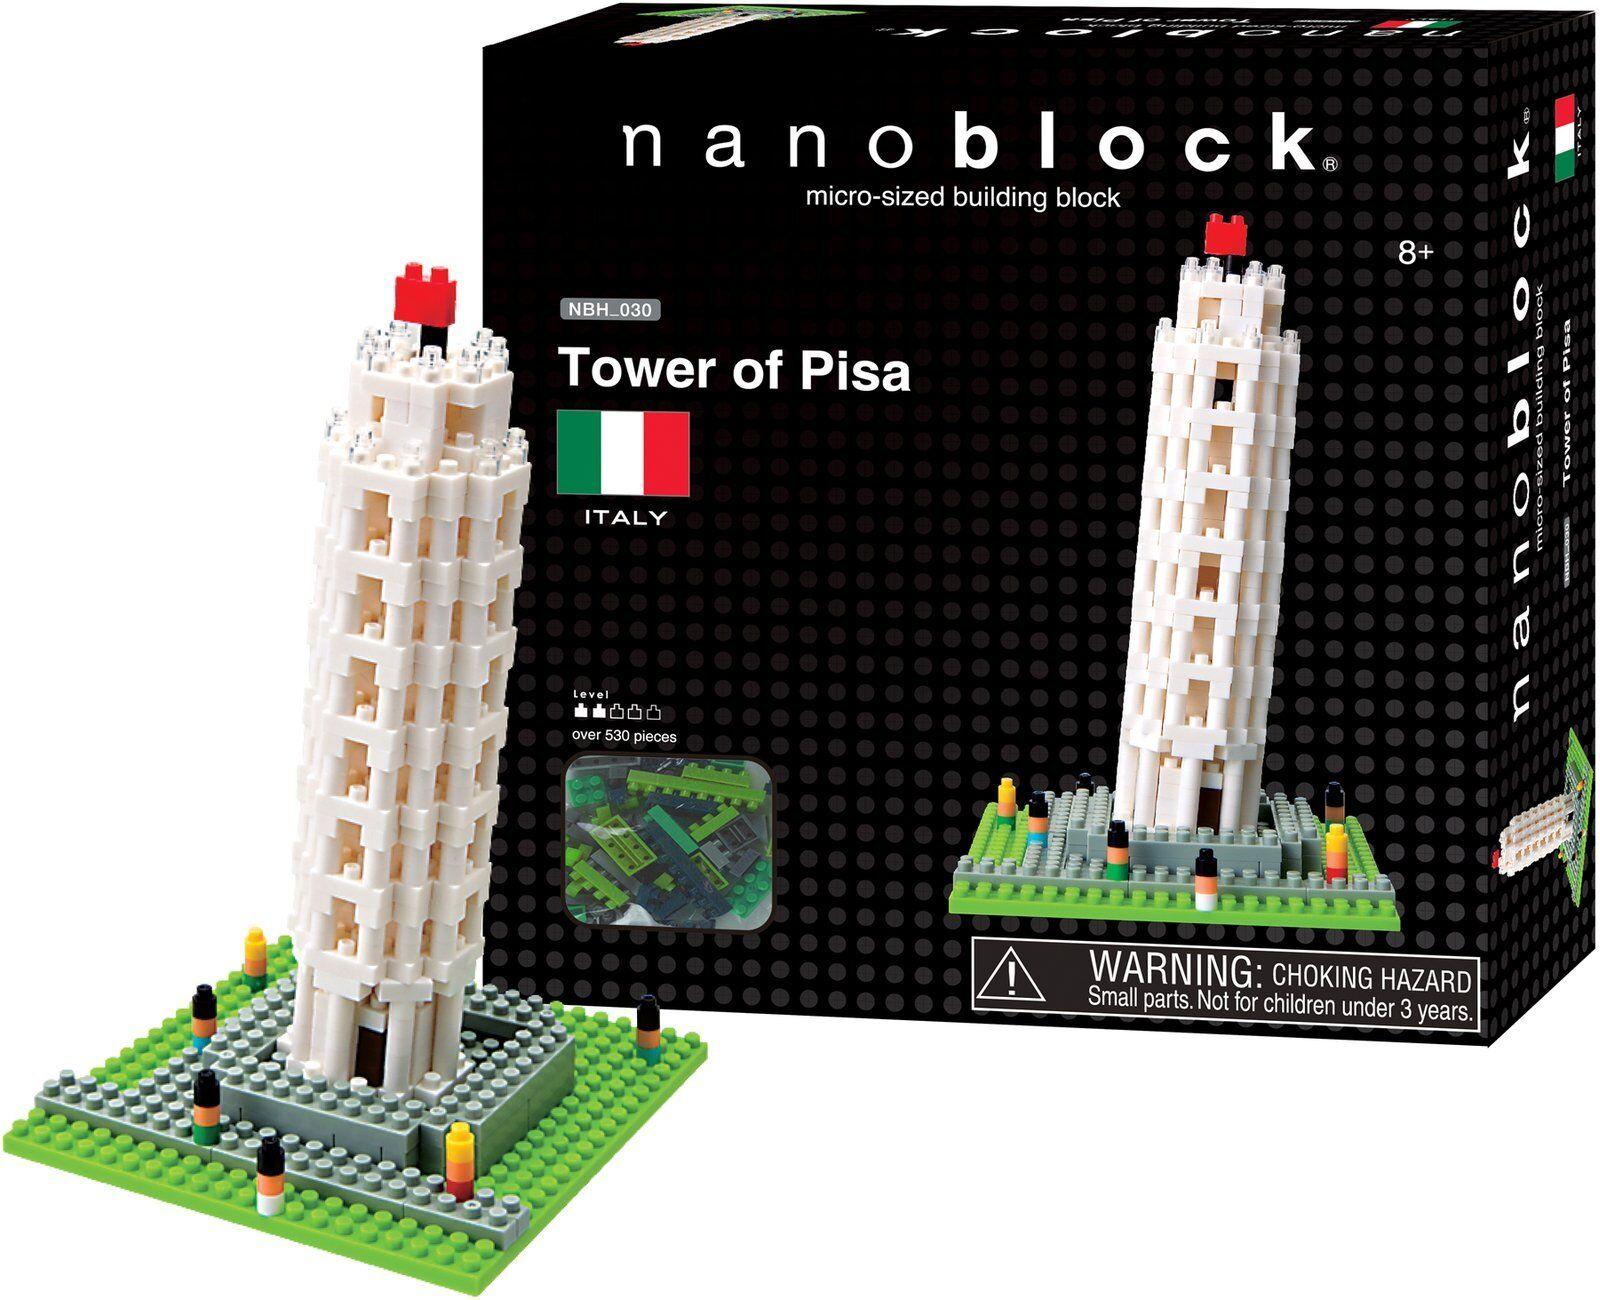 Tower of Pisa Nanoblock Miniature Building Blocks New Sealed Pk NBH030